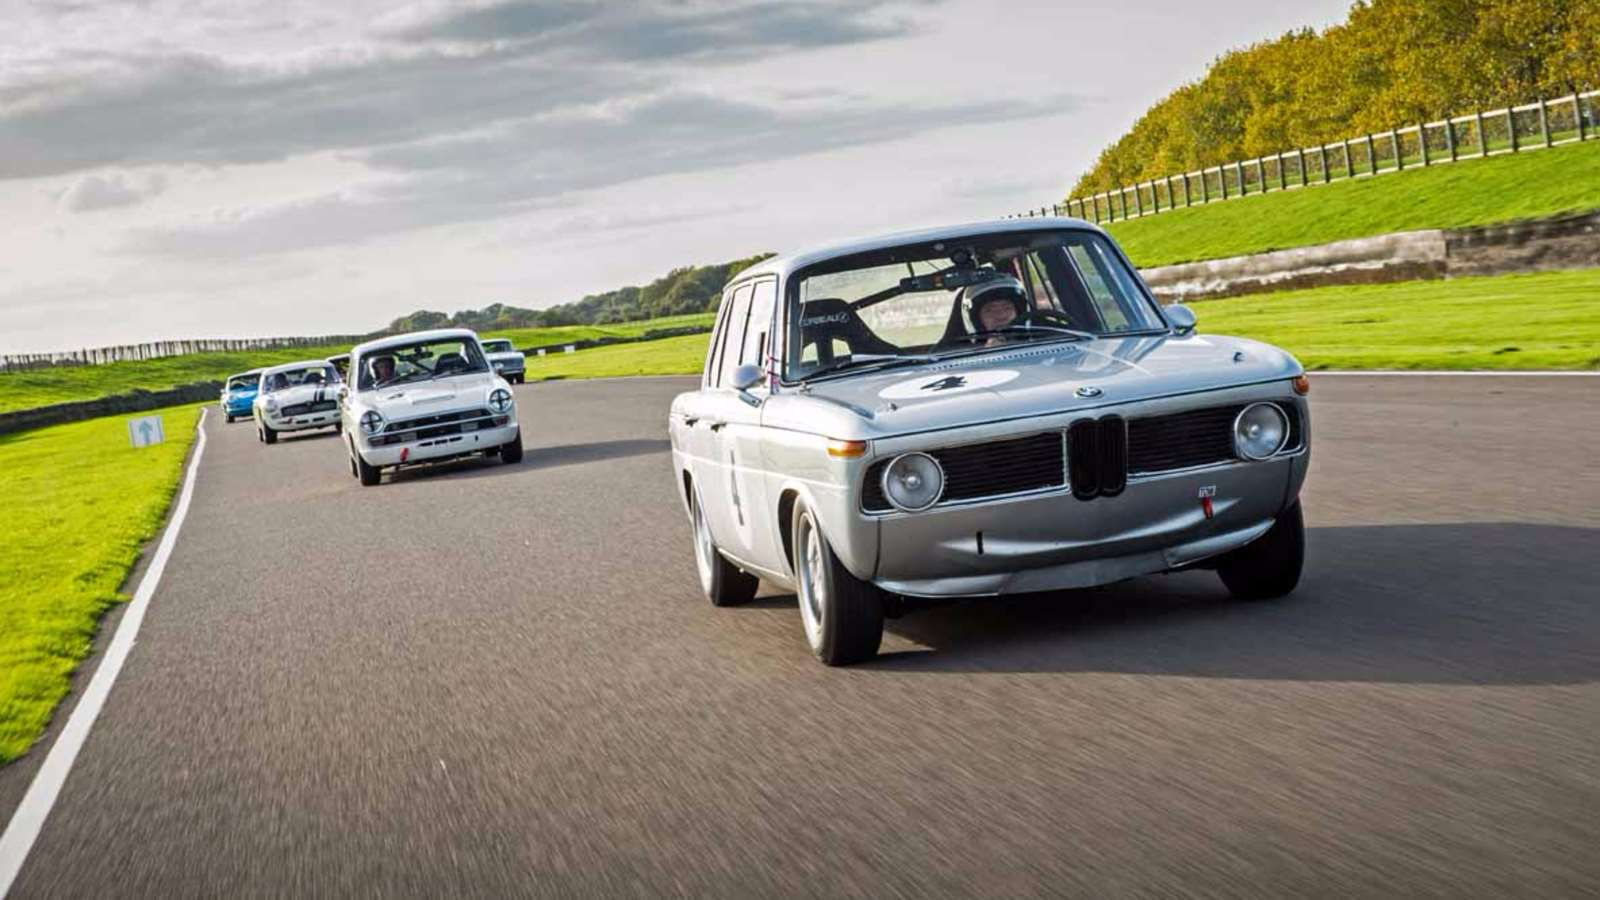 Dan Trent: BMW 1800 TI/SA - homologation special done right